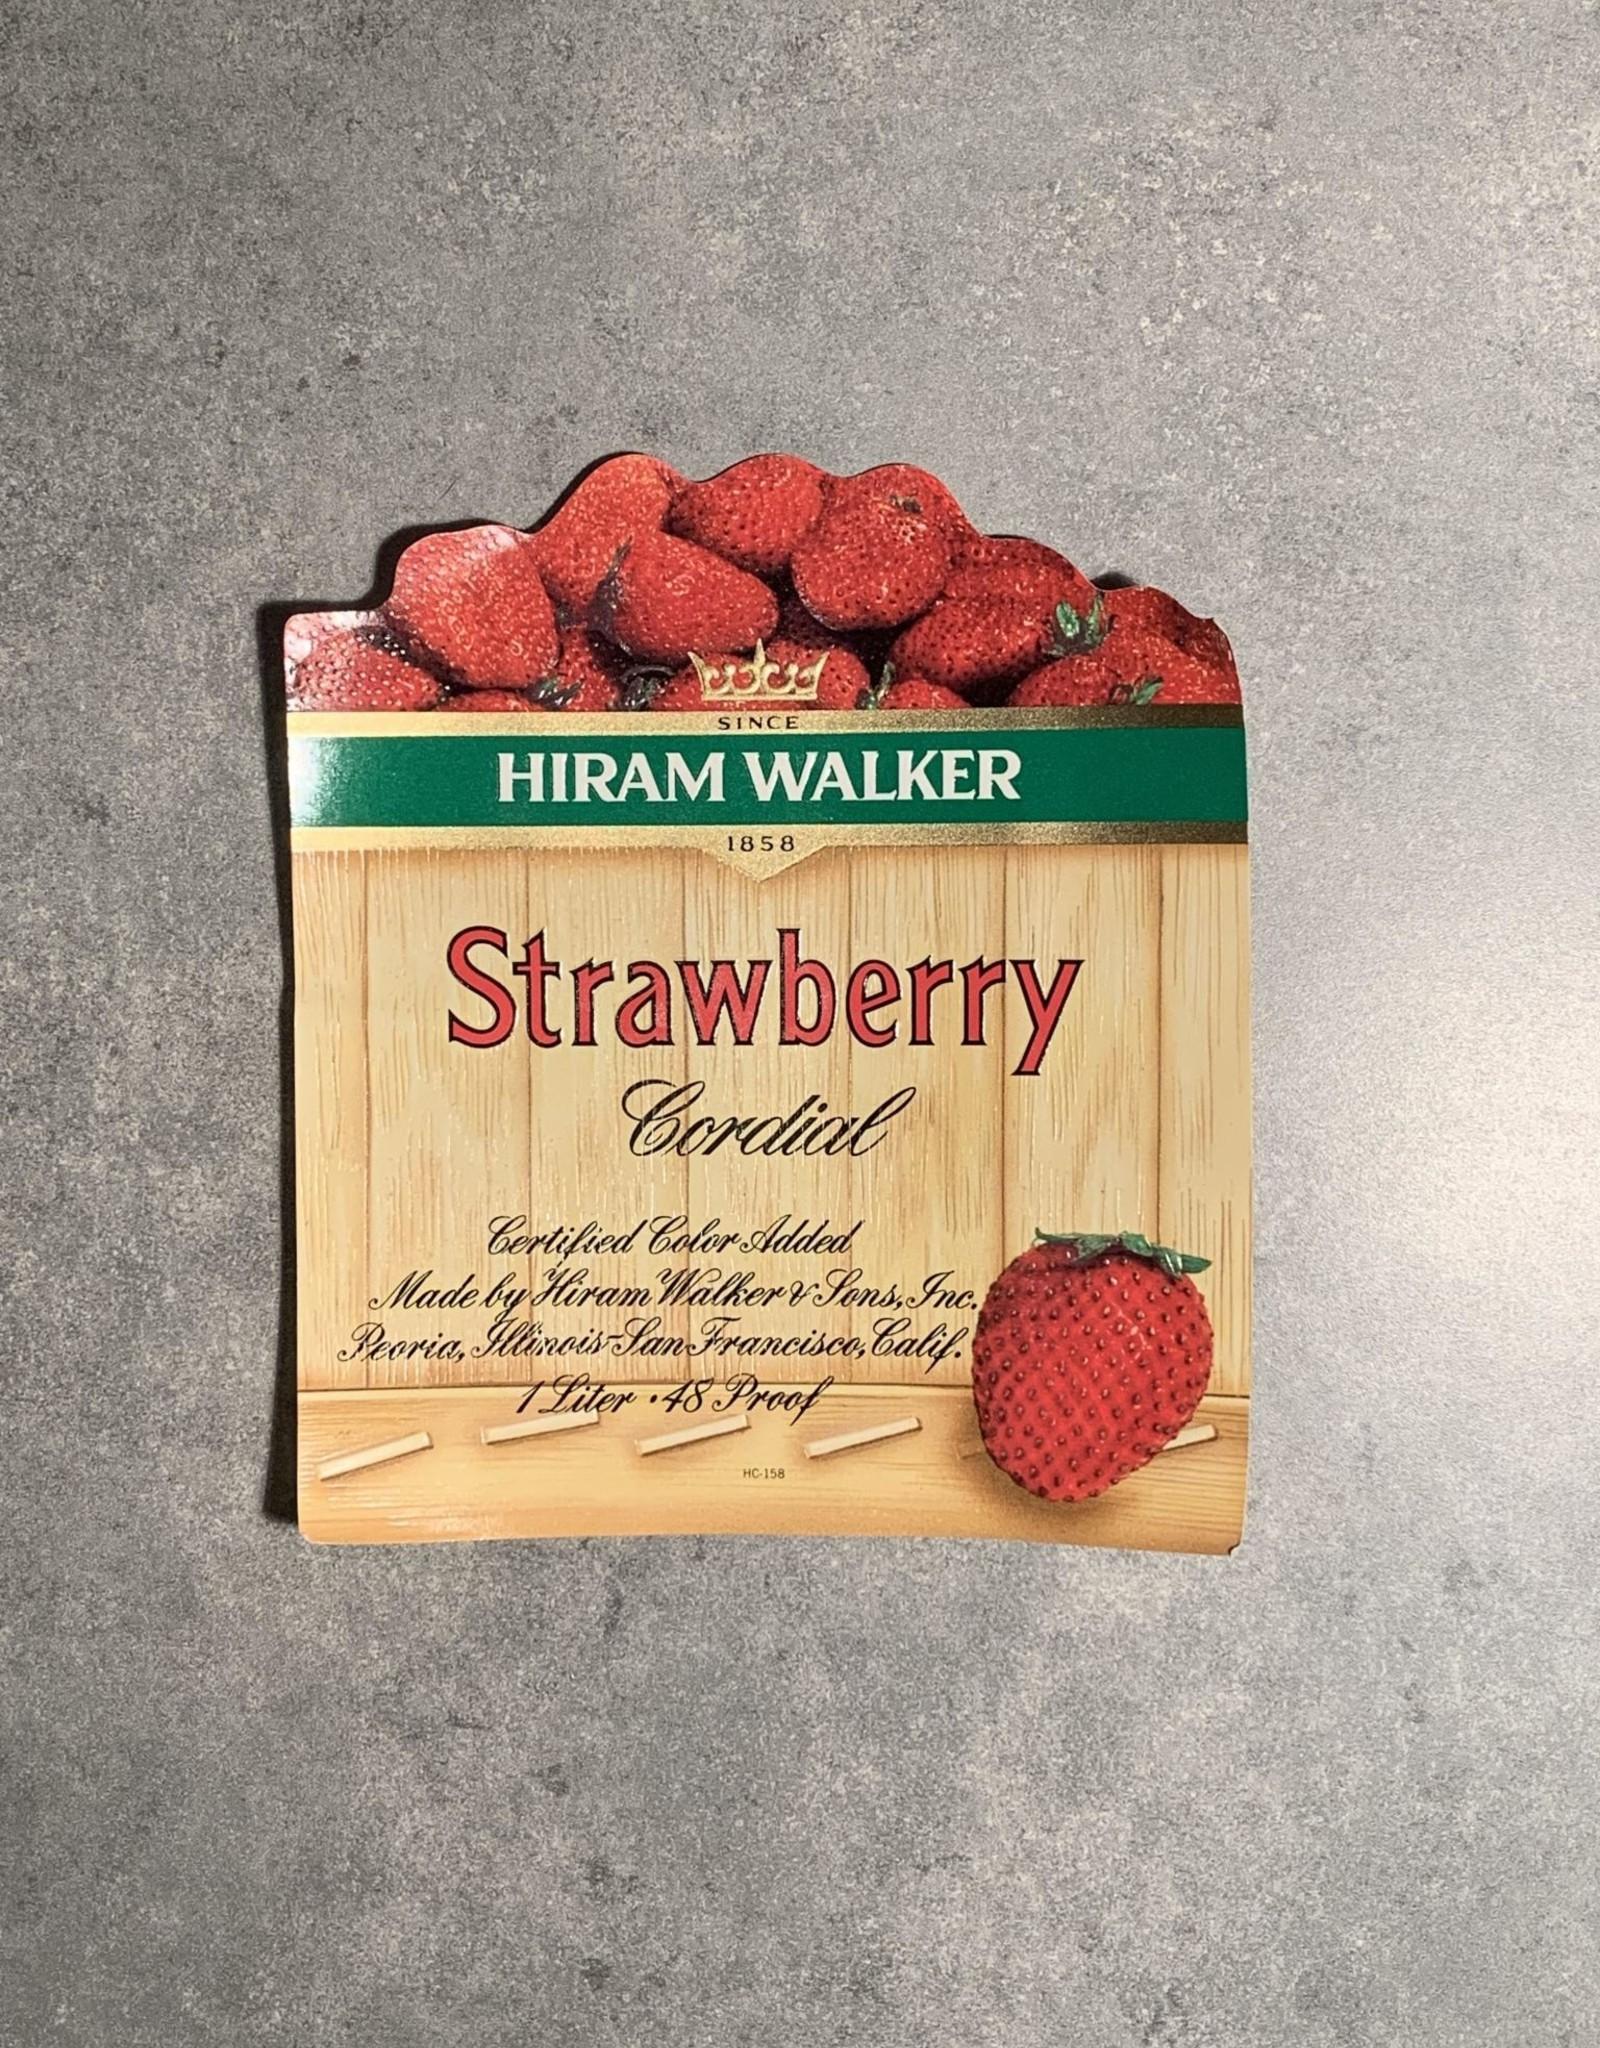 UA Merch Hiram Walker & Sons Peoria Il. Strawberry Cordial Label